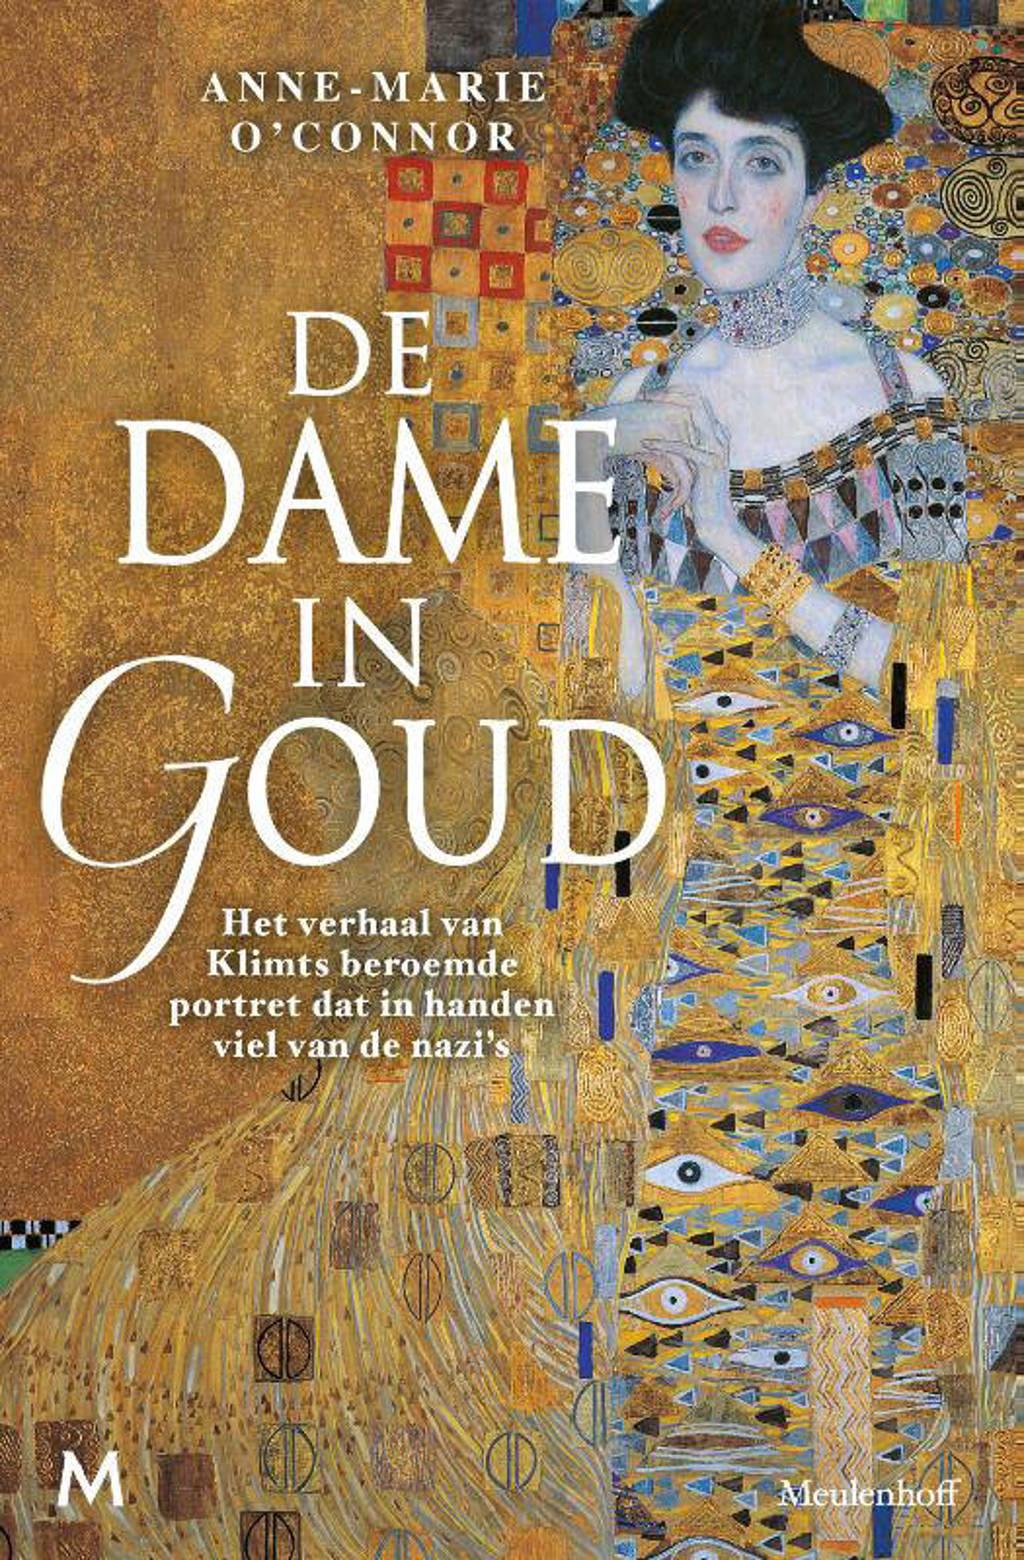 De dame in goud - Anne-Marie O'Connor